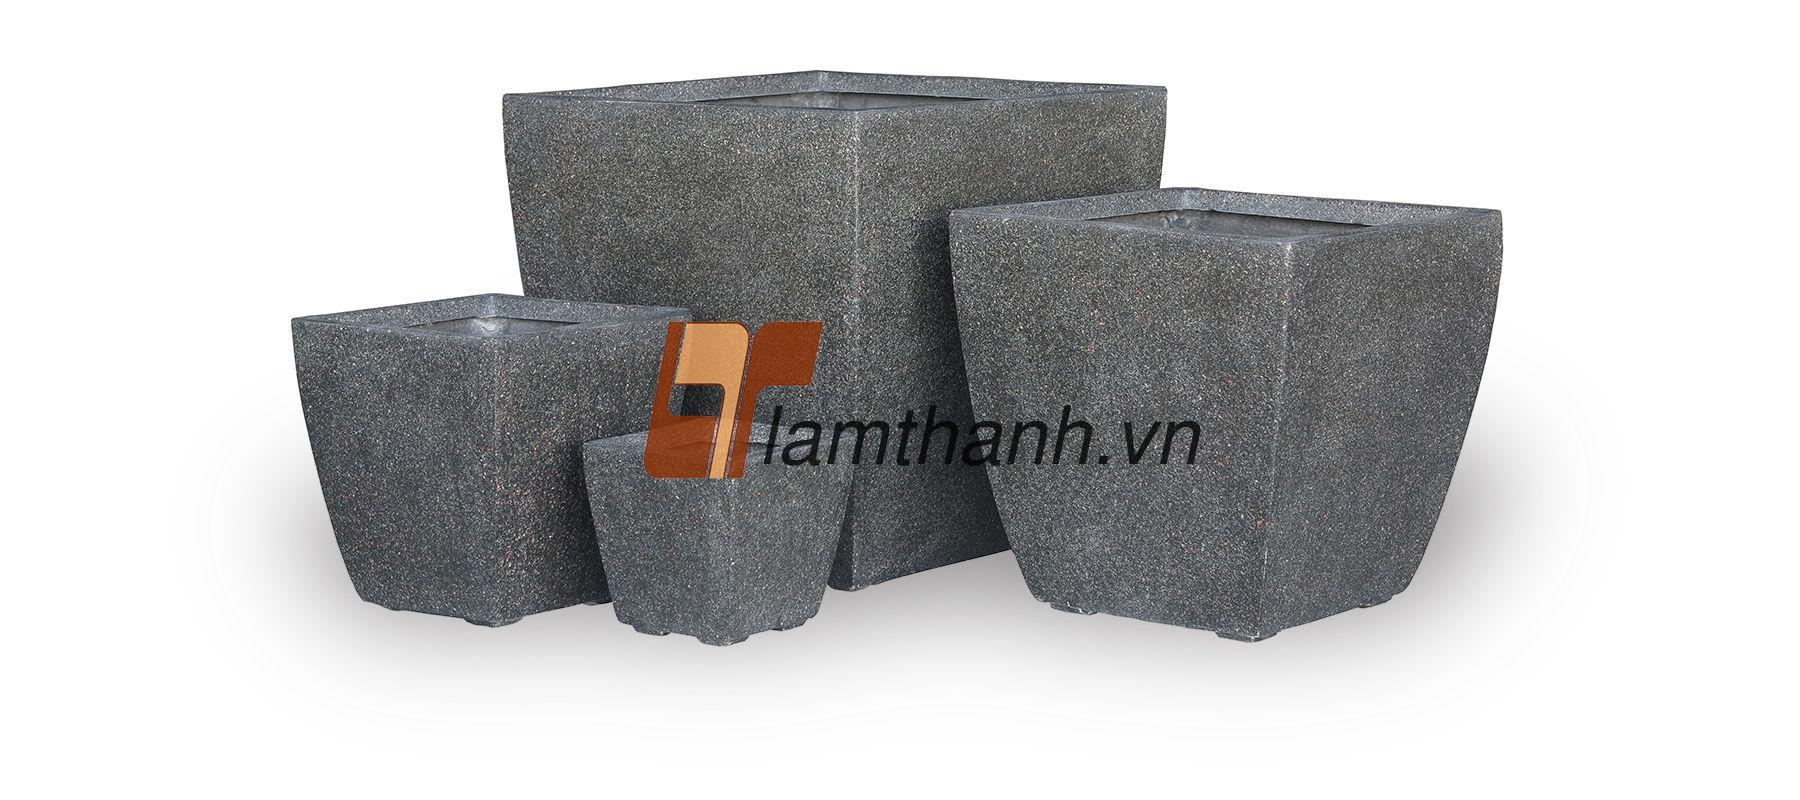 vietnam polystone, lightweigh GRP 17